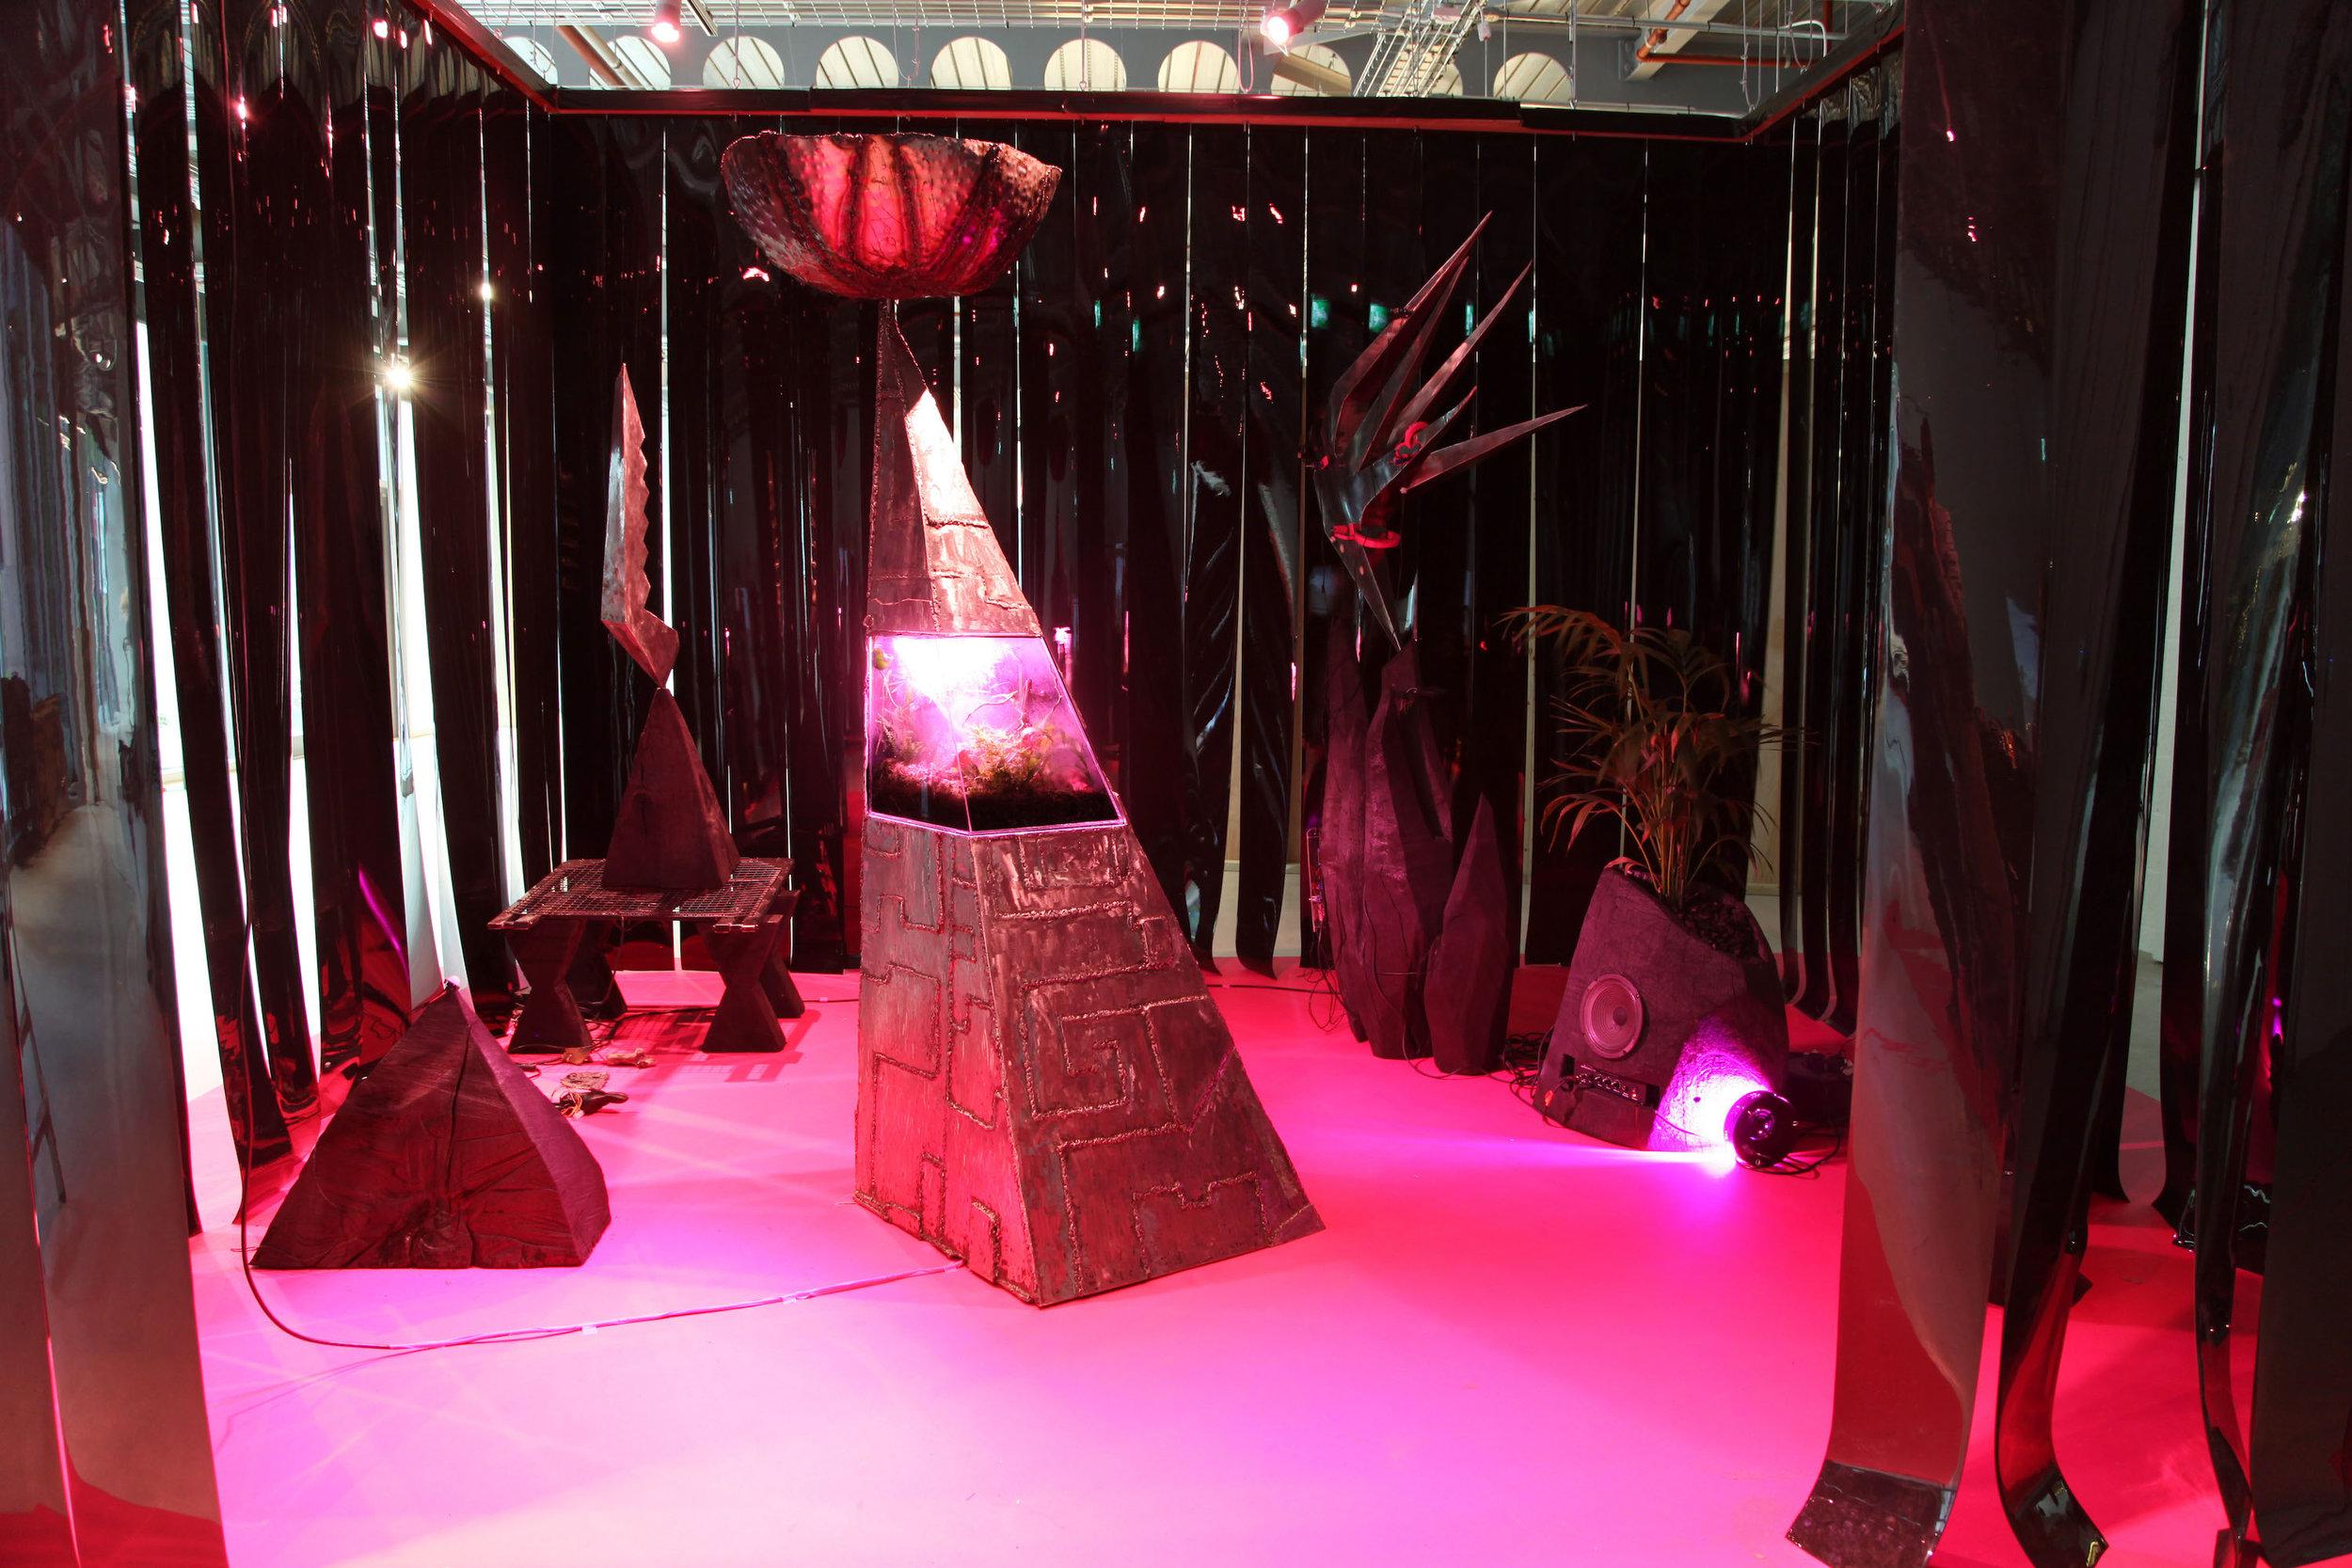 Sisyphus In Retrograde - Sol Bailey-Barker, Evy Jokhova, Adeline De Monseignat, Nissa Nishikawa & Harrison Pearce. Curated by Gabriella Sonabend & Aindrea Emelife09/04/2019 - 04/05/2019Aindrea Contemporary x London Curatorial, 17-19 Triton Street, NW1 3BF